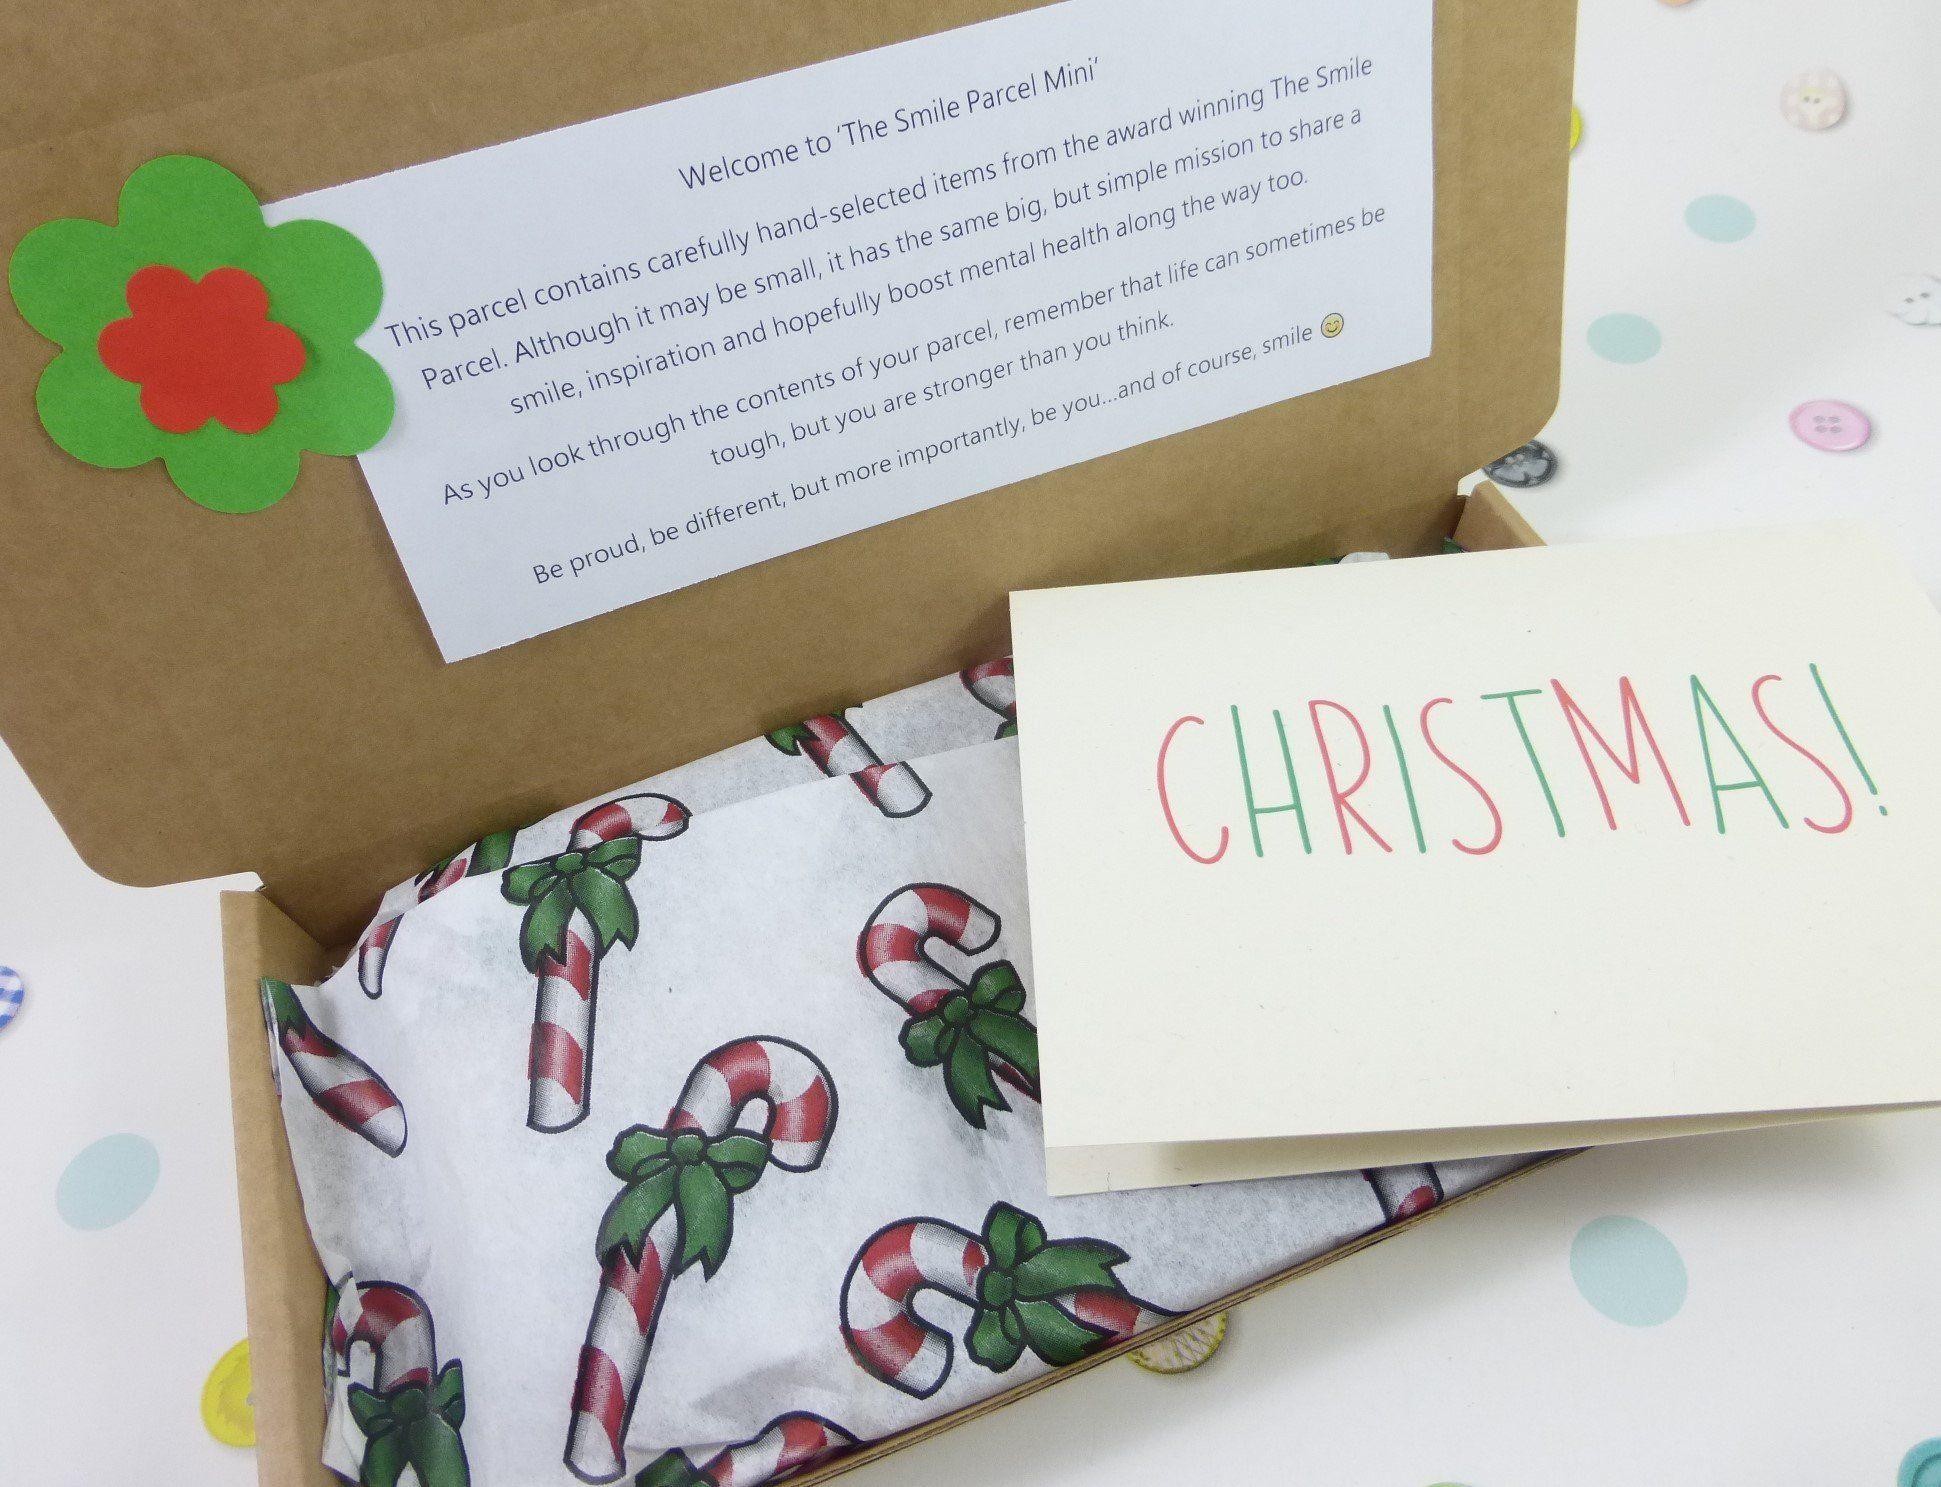 Christmas Stars, Letterbox Friendly, Pick Me Up Gift – The Smile Parcel Mini Kind Shop 2